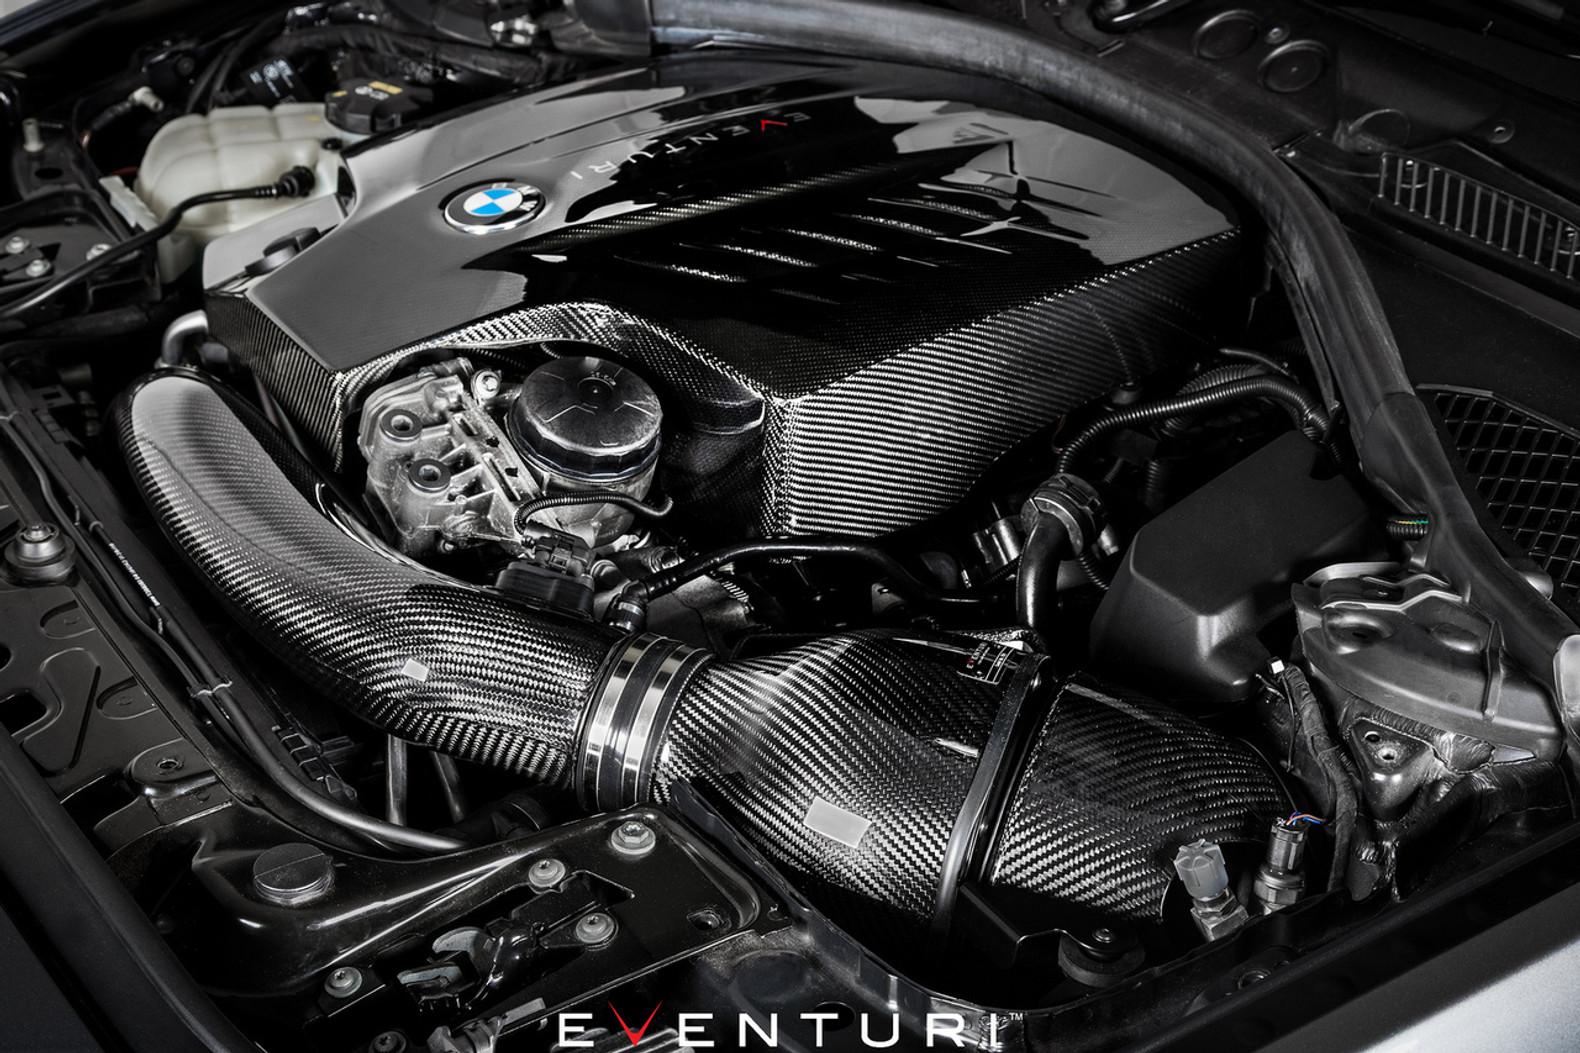 Auto Mamada eventuri black carbon intake v2 - bmw m2 f2x -